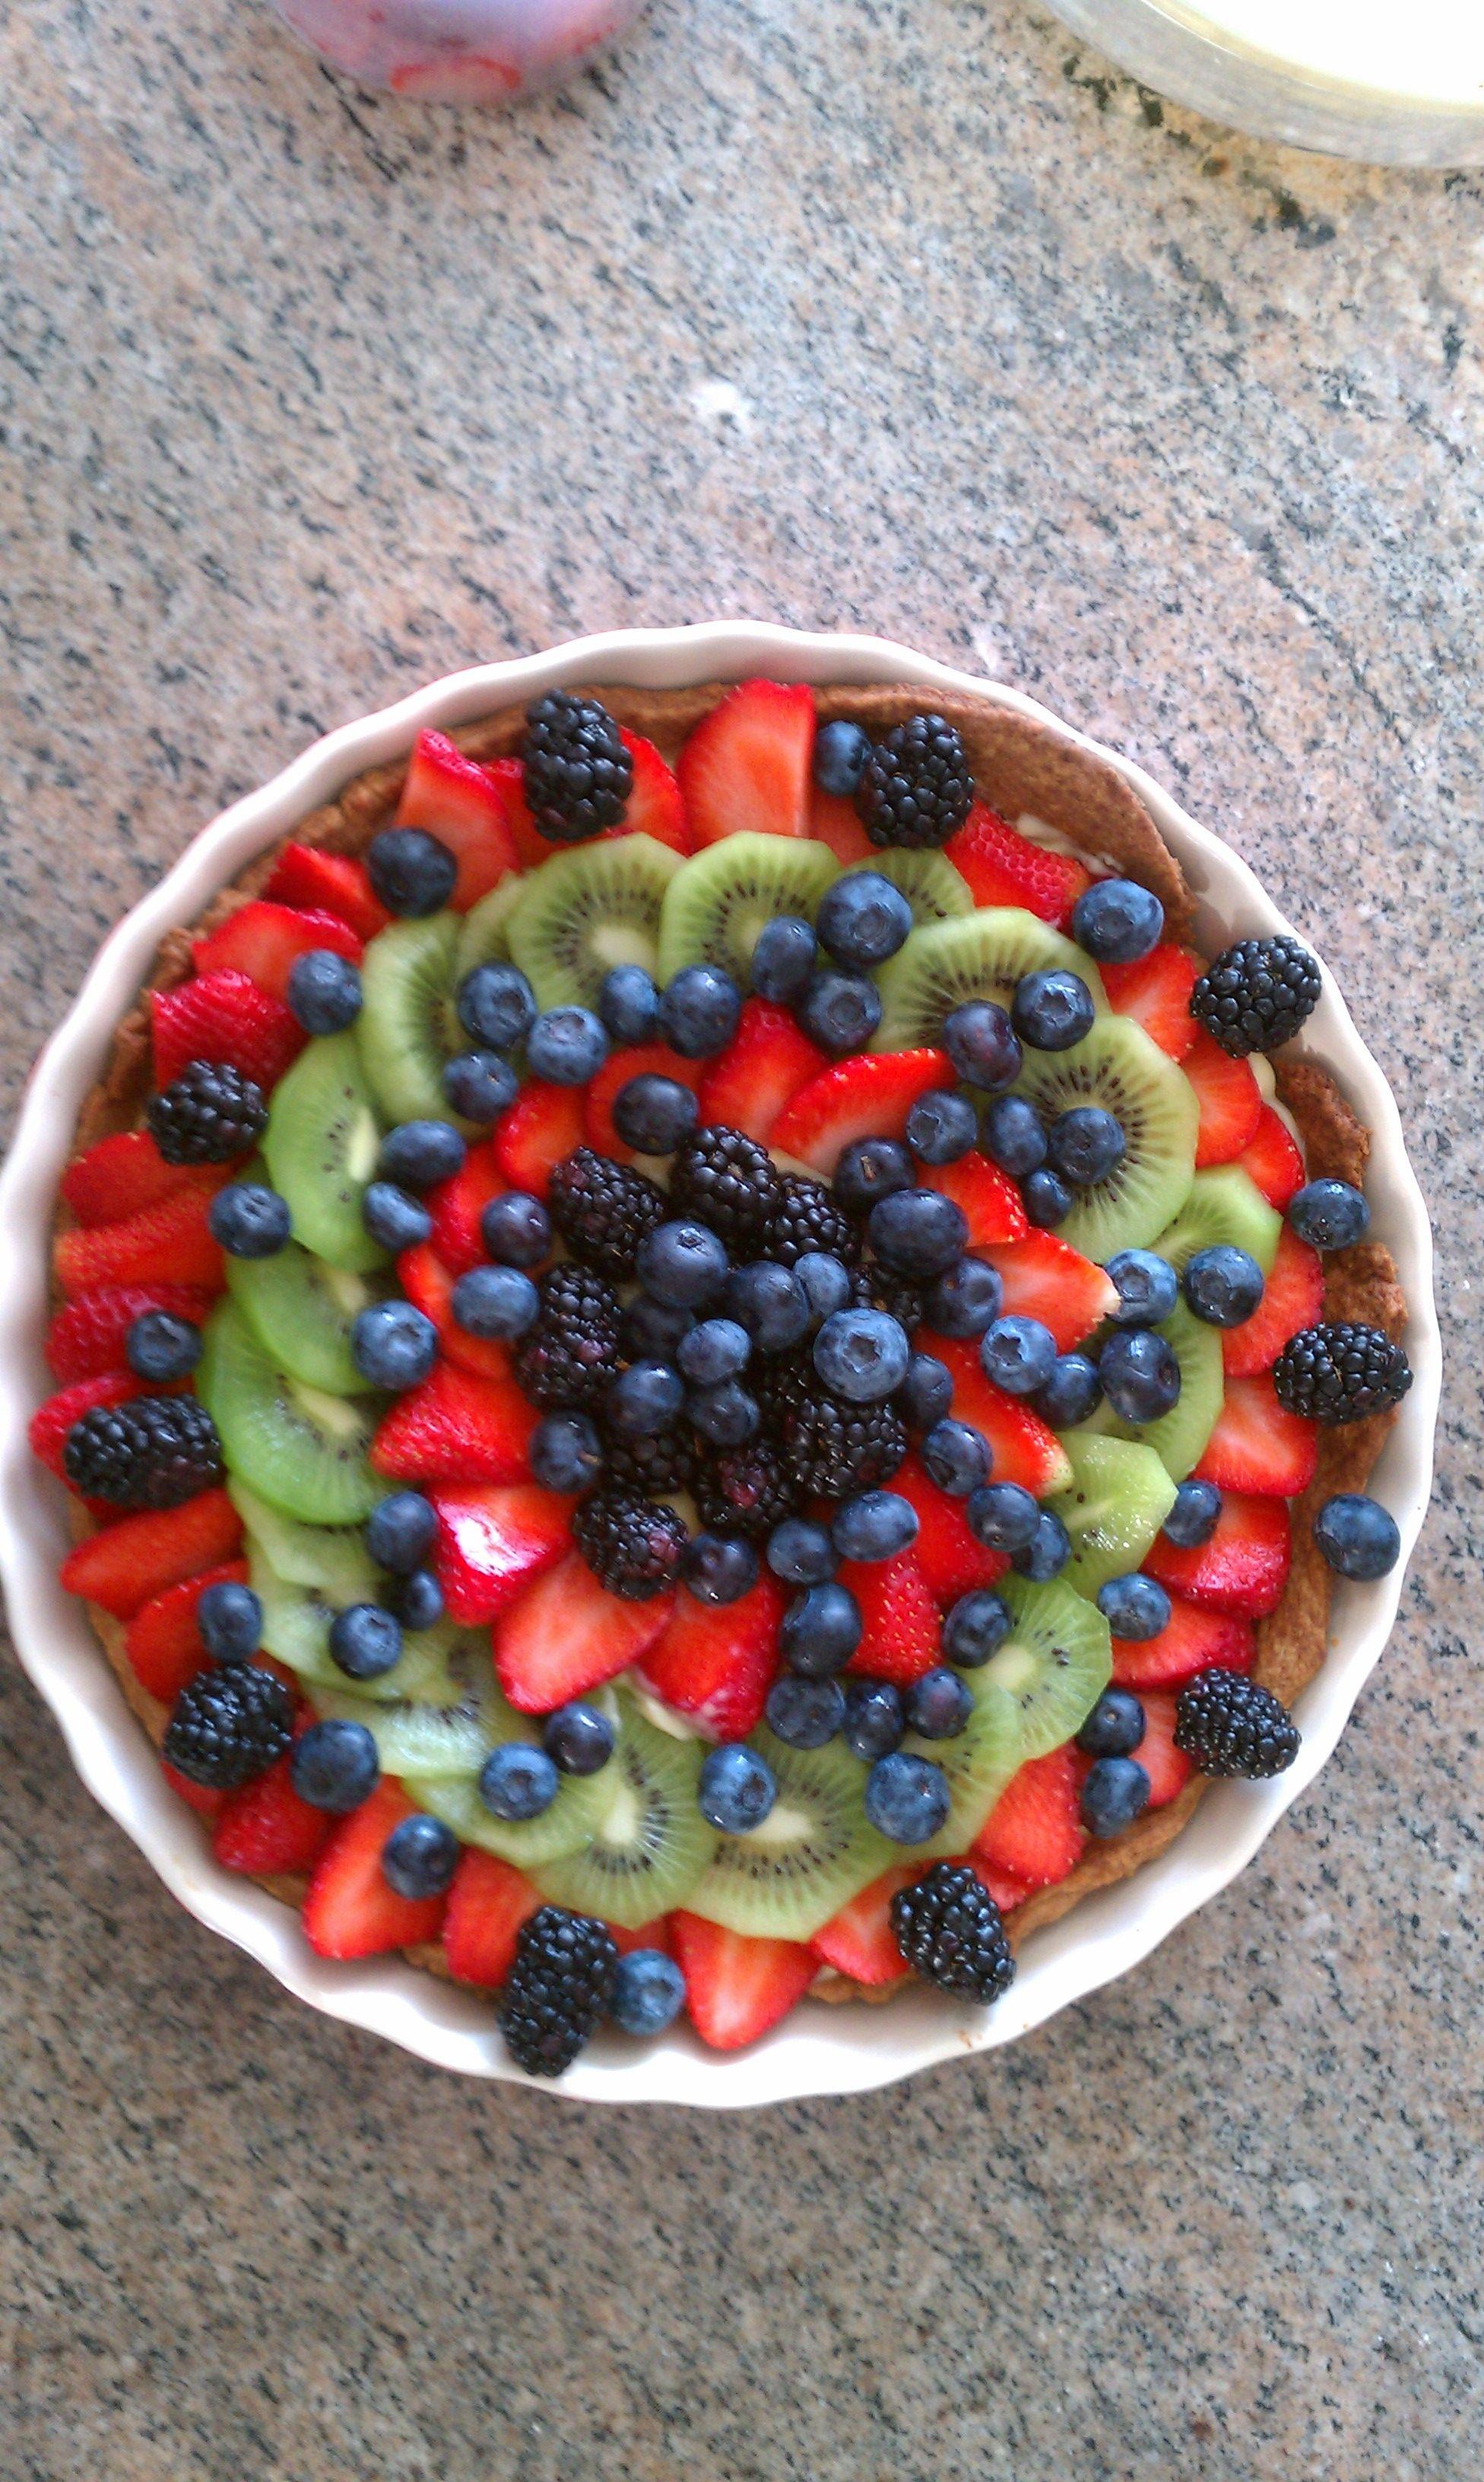 Homemade fruit tart ina garten recipe everyday food